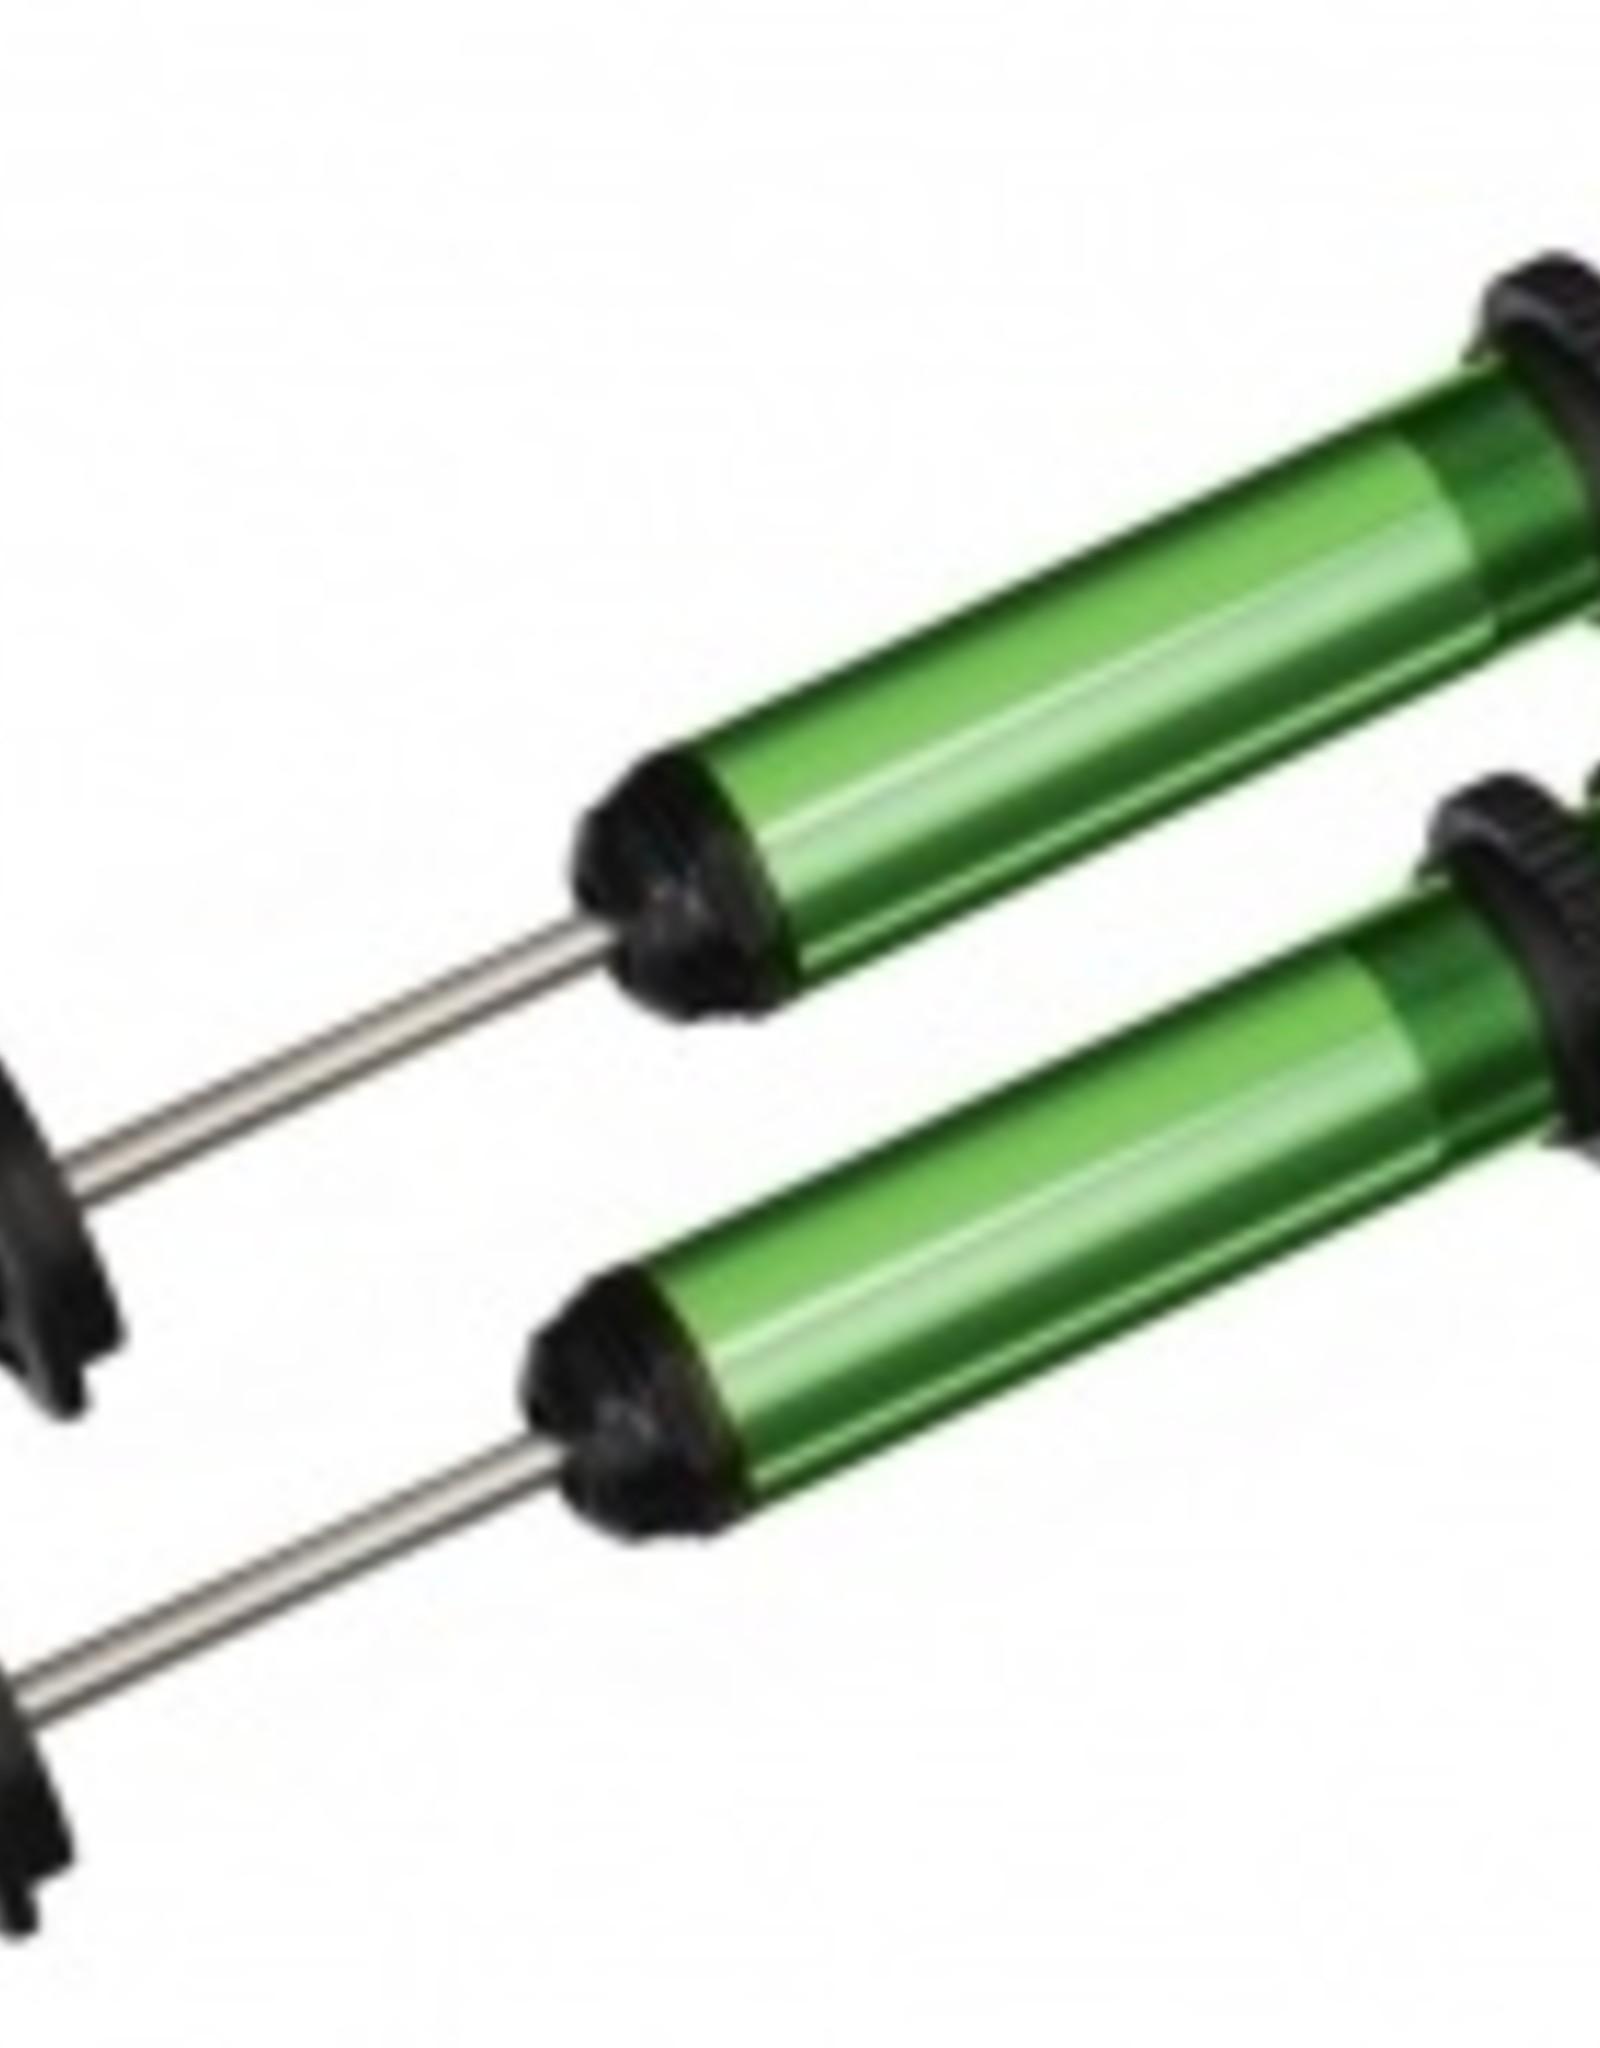 Traxxas Traxxas X-Maxx Traxxas X-Maxx Shocks, GTX, aluminum (green-anodized) (fully assembled w/o springs) (2)